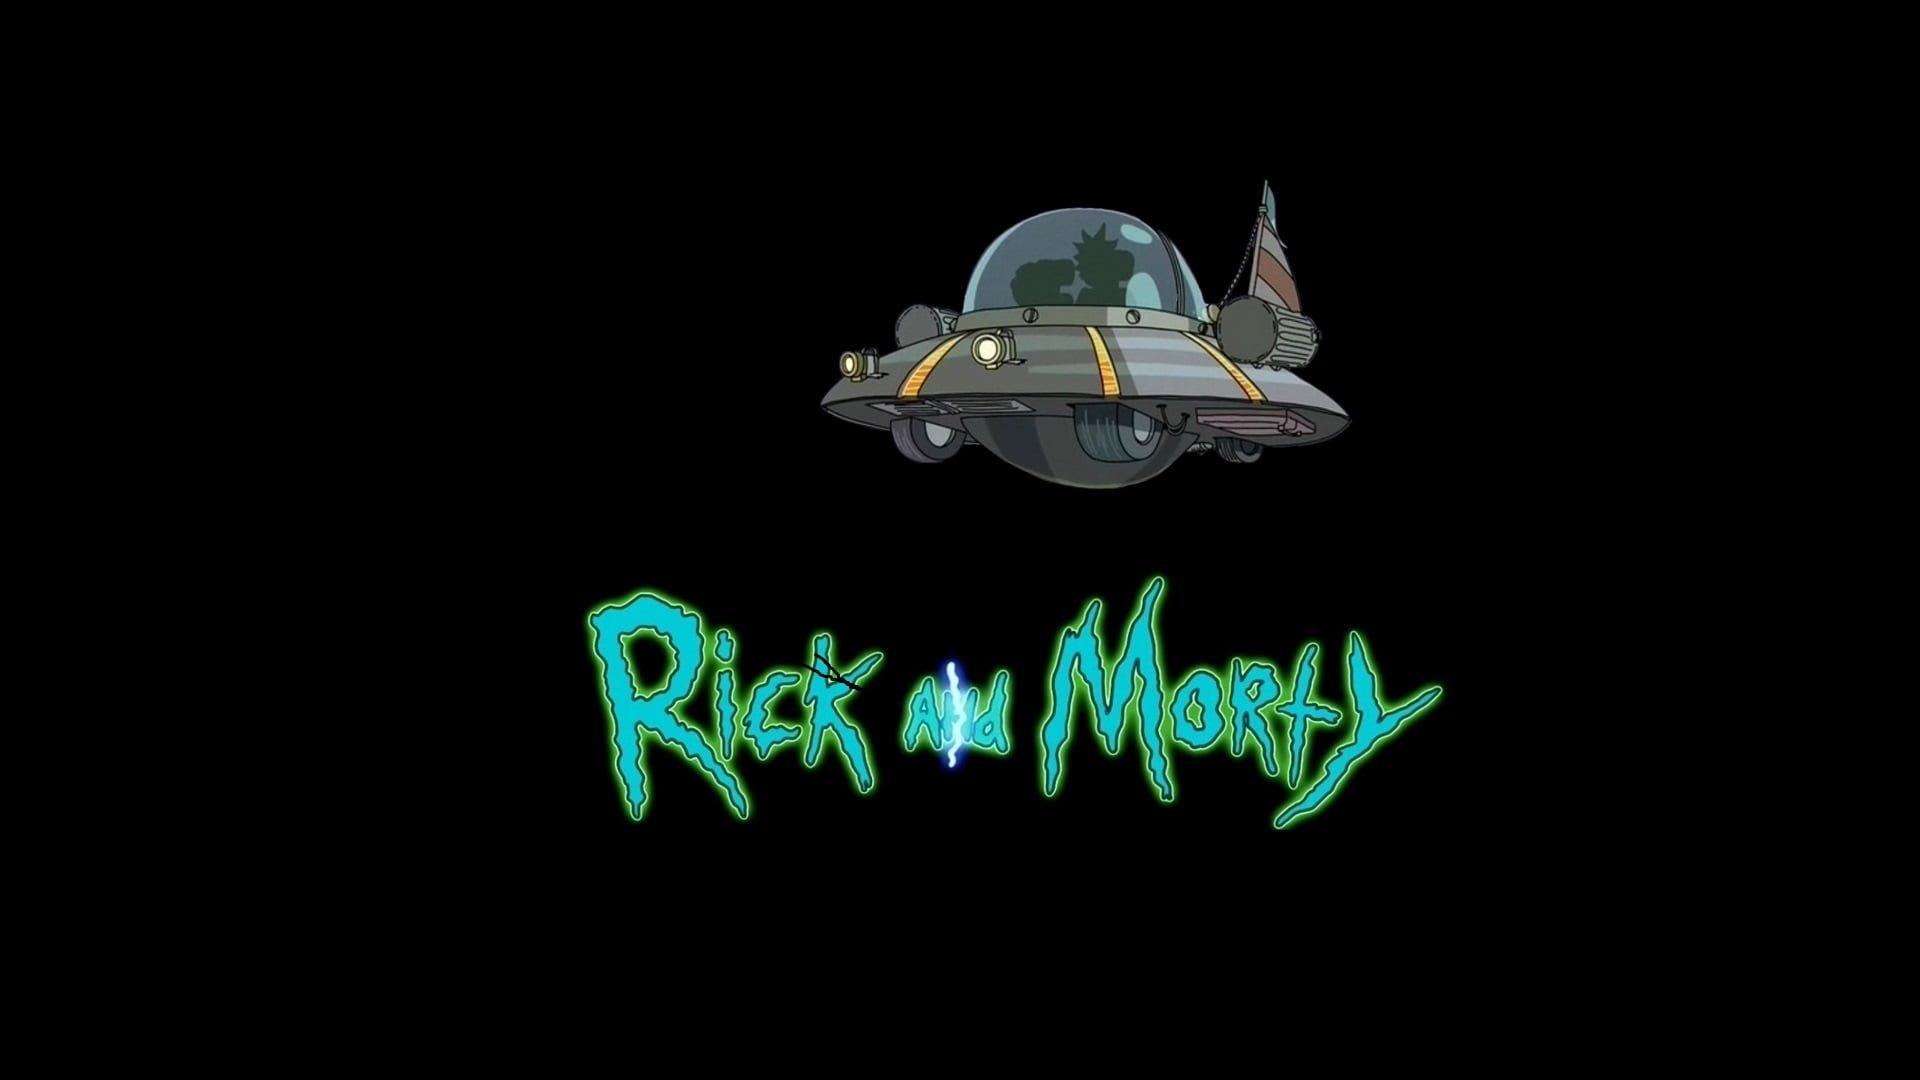 rick and morty phone wallpaper